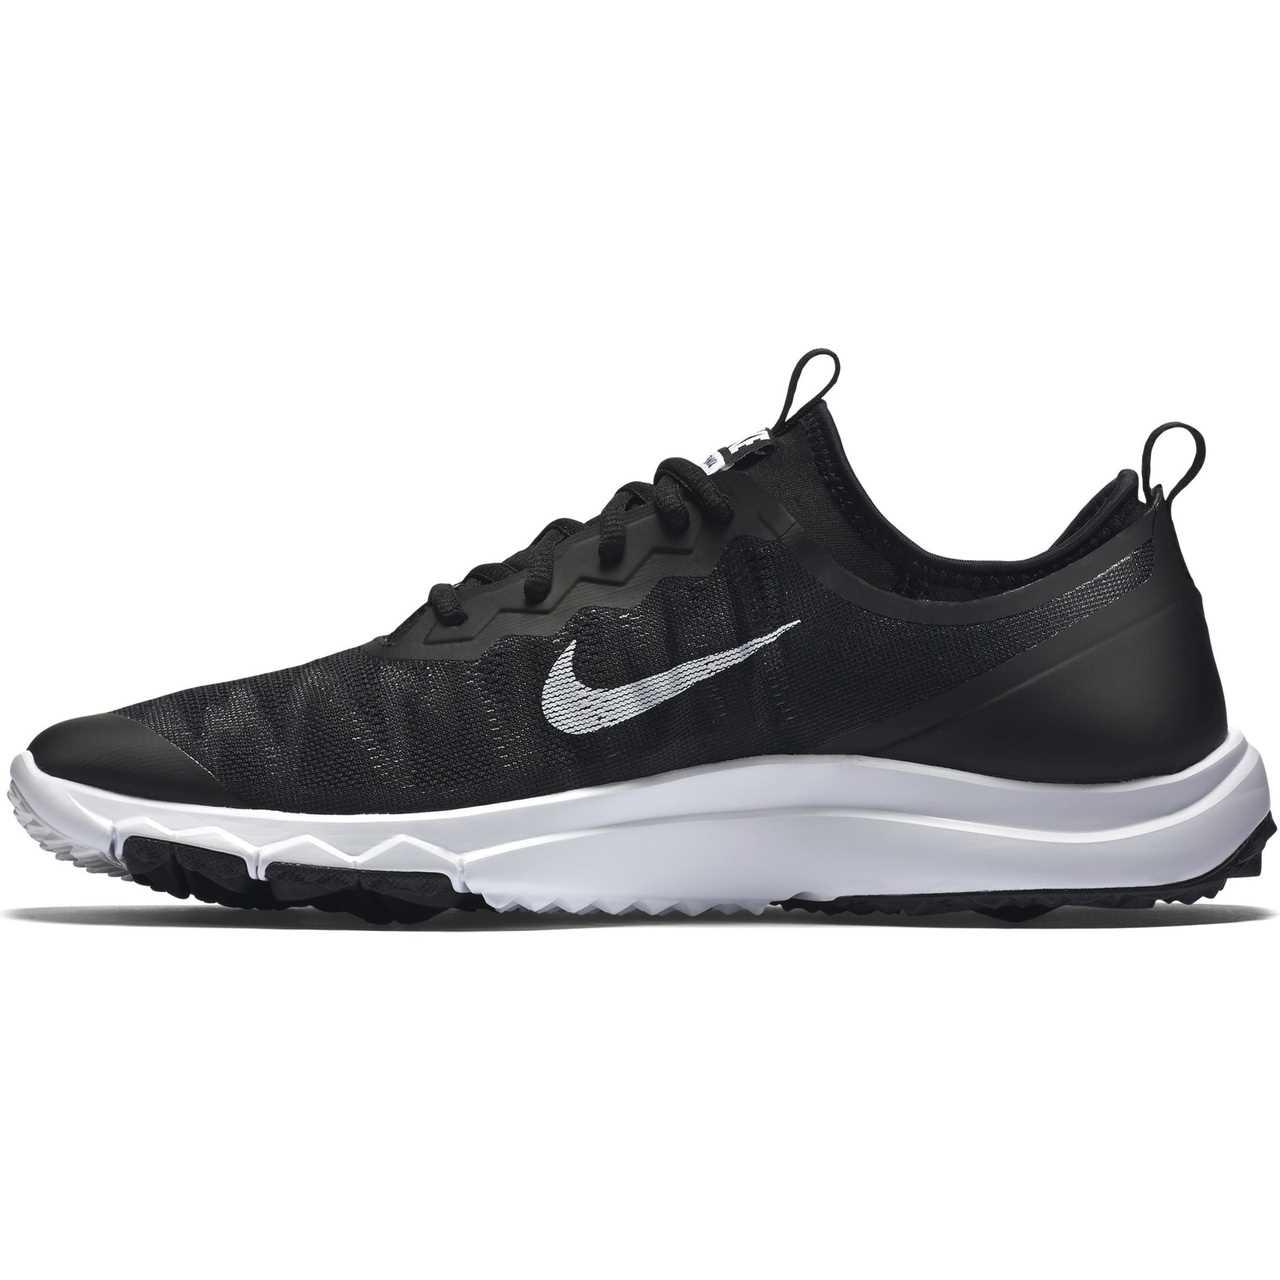 fbd46d32d2b4 Nike FI Bermuda Women s Spikeless Golf Shoe - Black White - Golfland ...